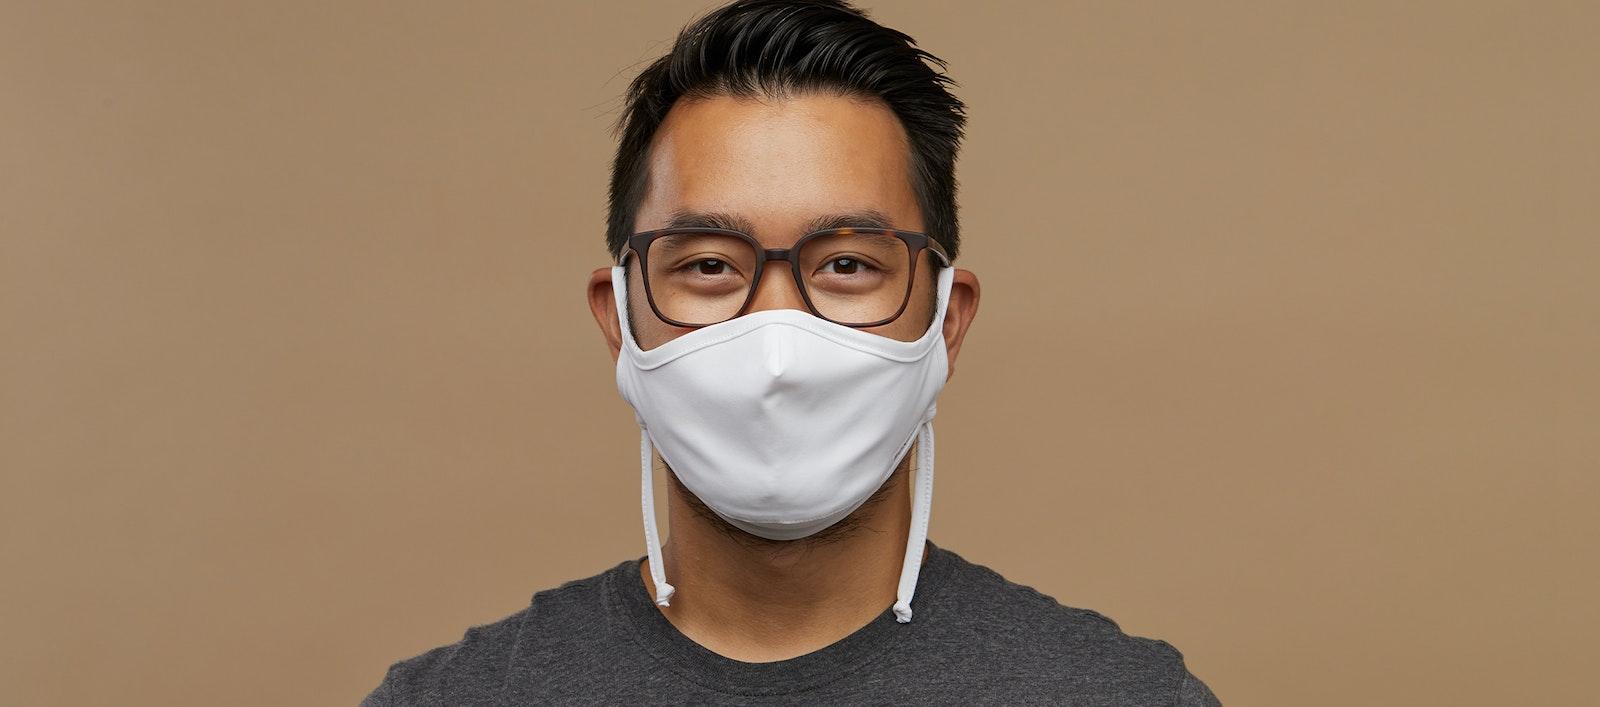 Affordable Fashion Glasses Accessory Men Women BonLook Mask White Front